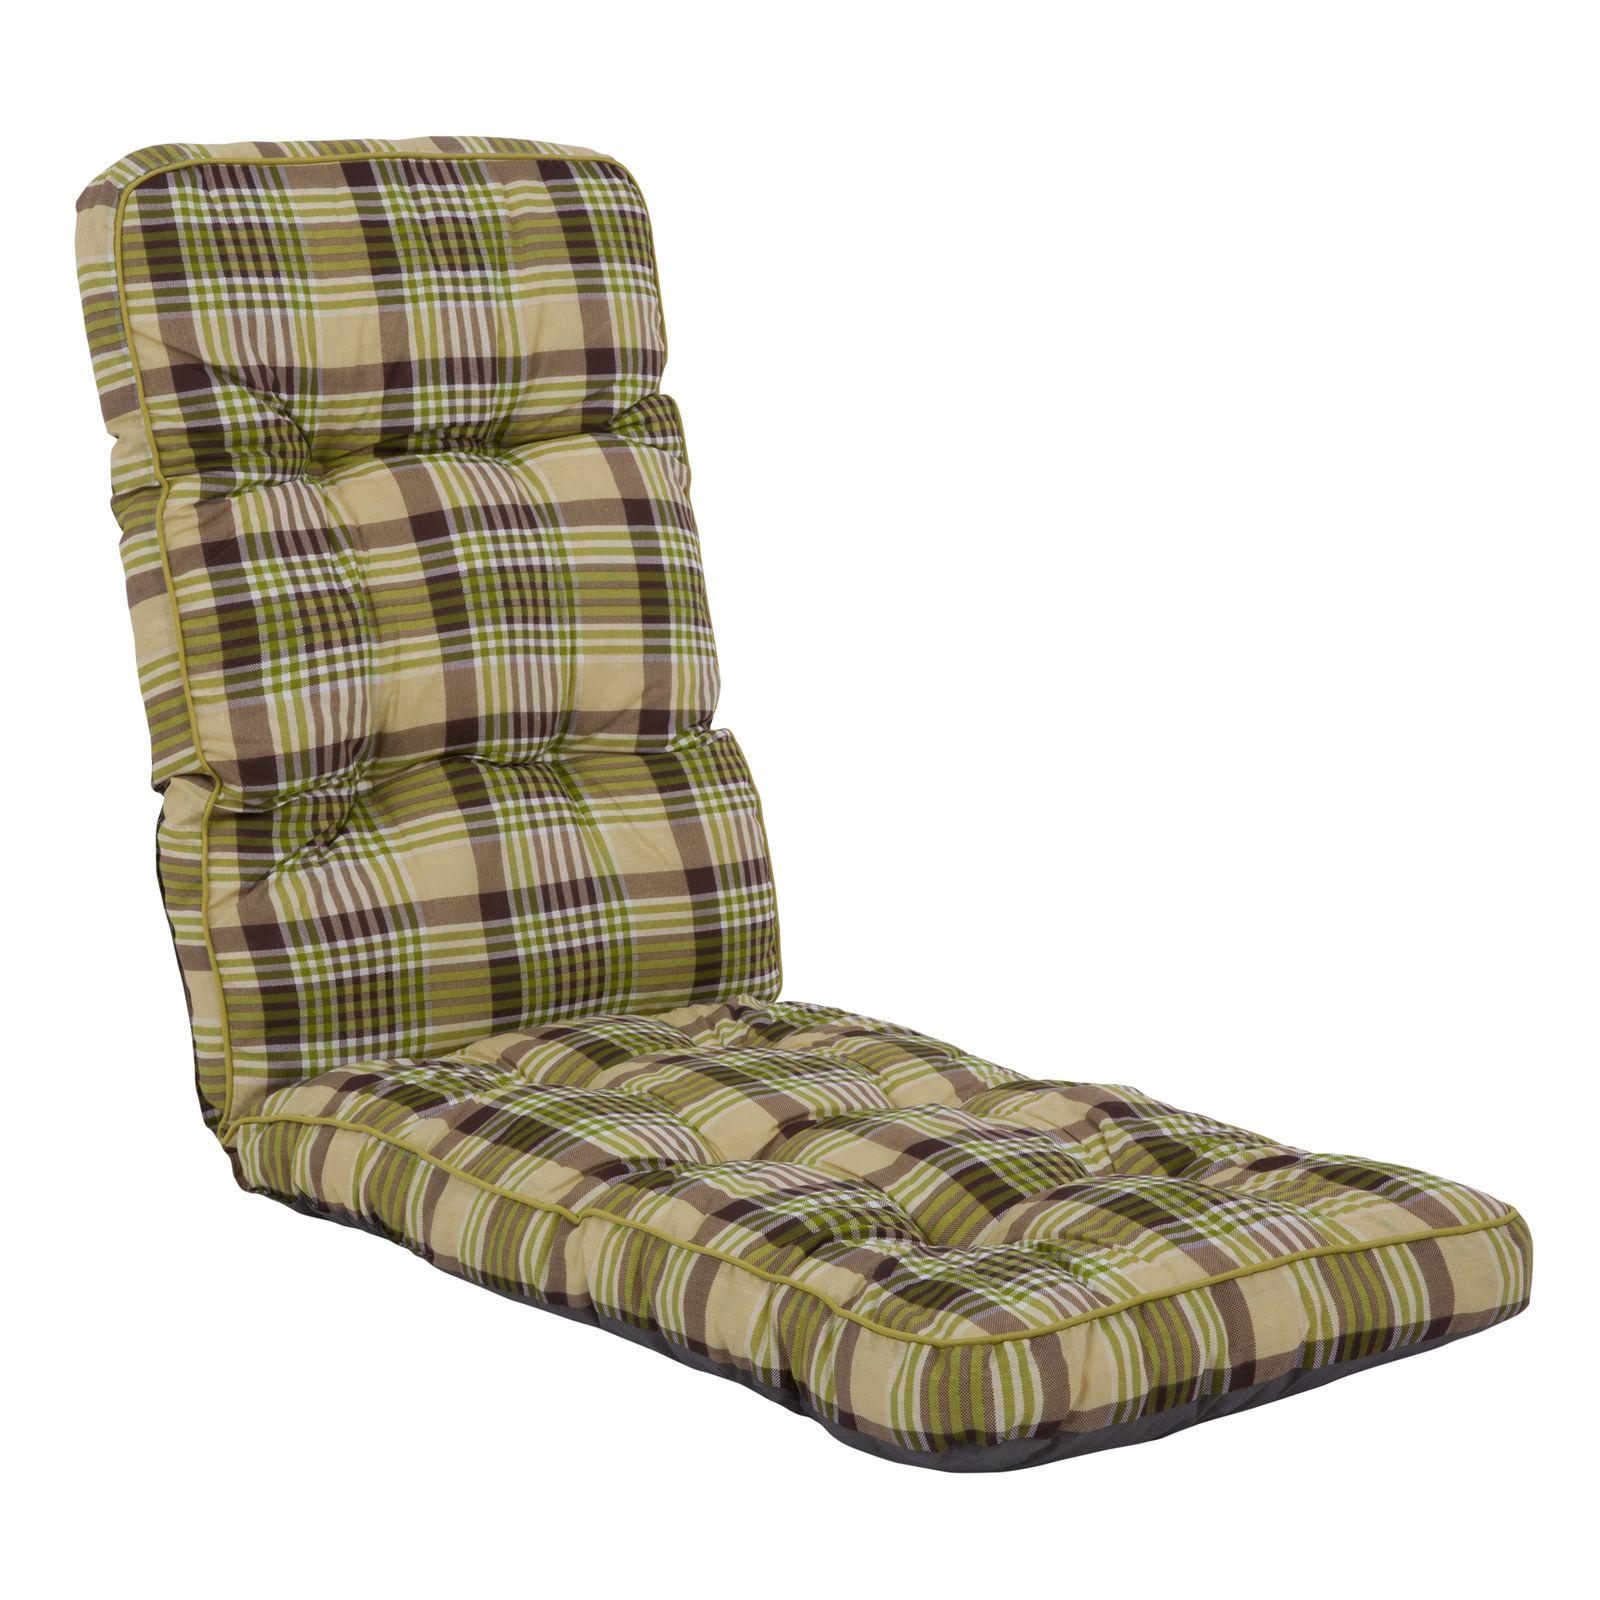 Poduszka na fotel Royal / Lena Plus 8/10 B003-12PB PATIO